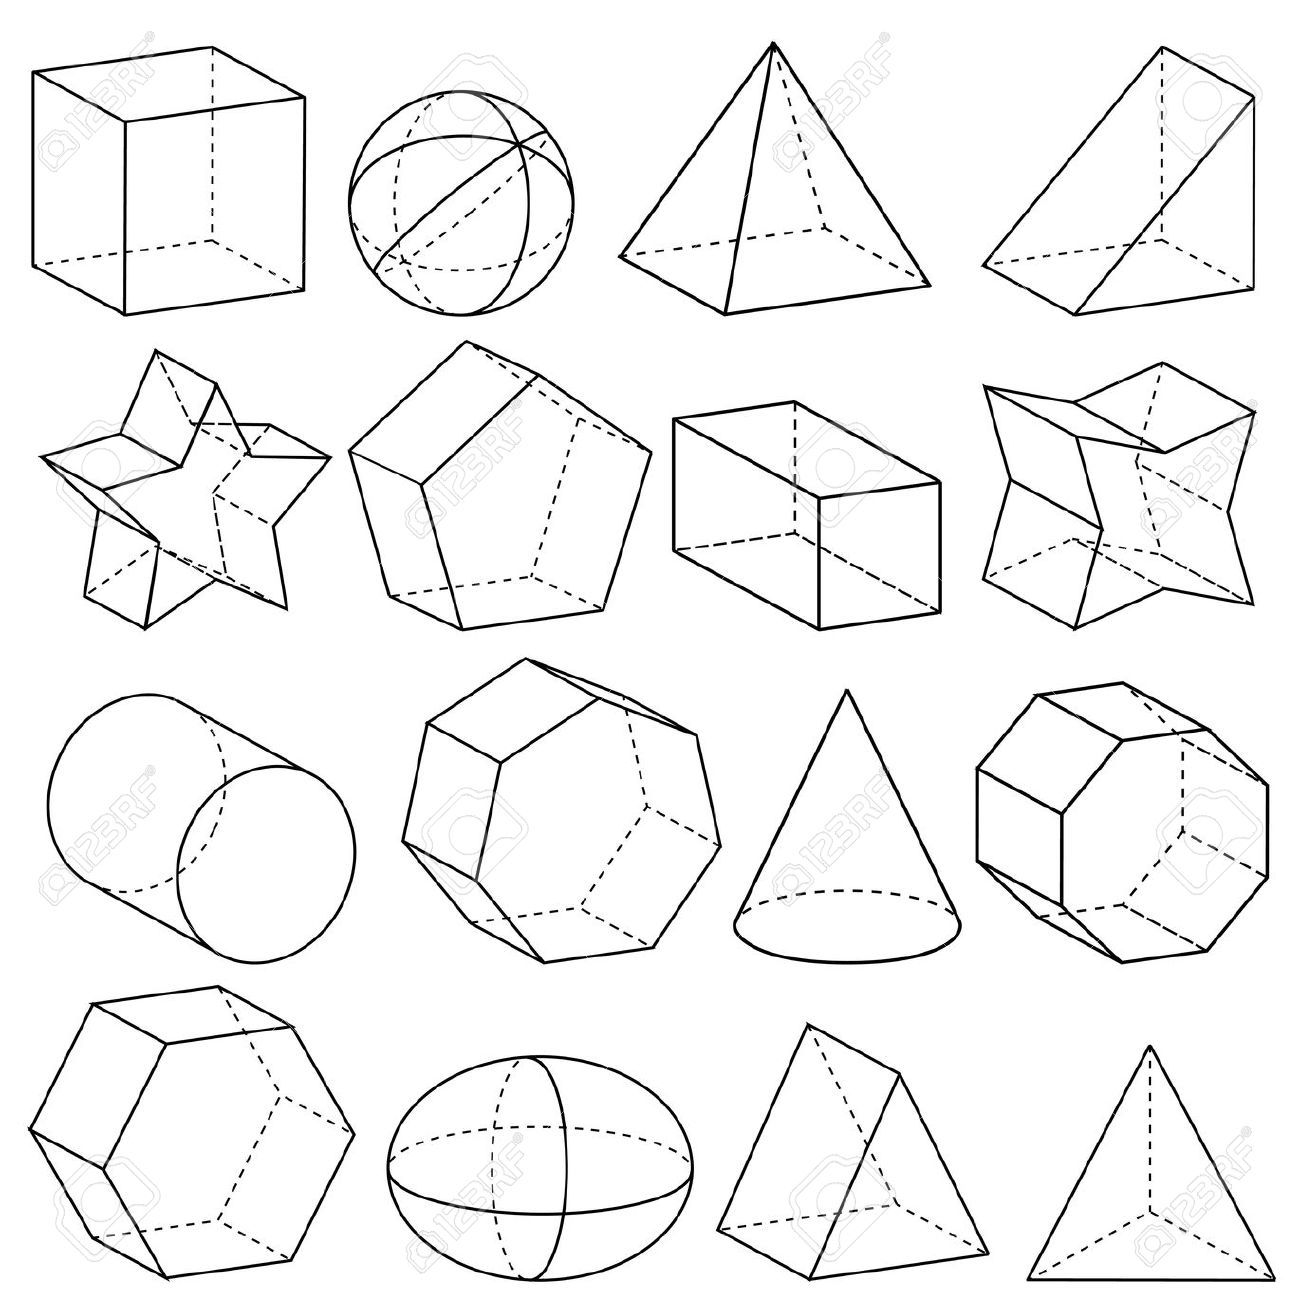 8812500 geometry stock vector math geometry drawingg 13001300 8812500 geometry stock vector math geometry drawingg ccuart Gallery